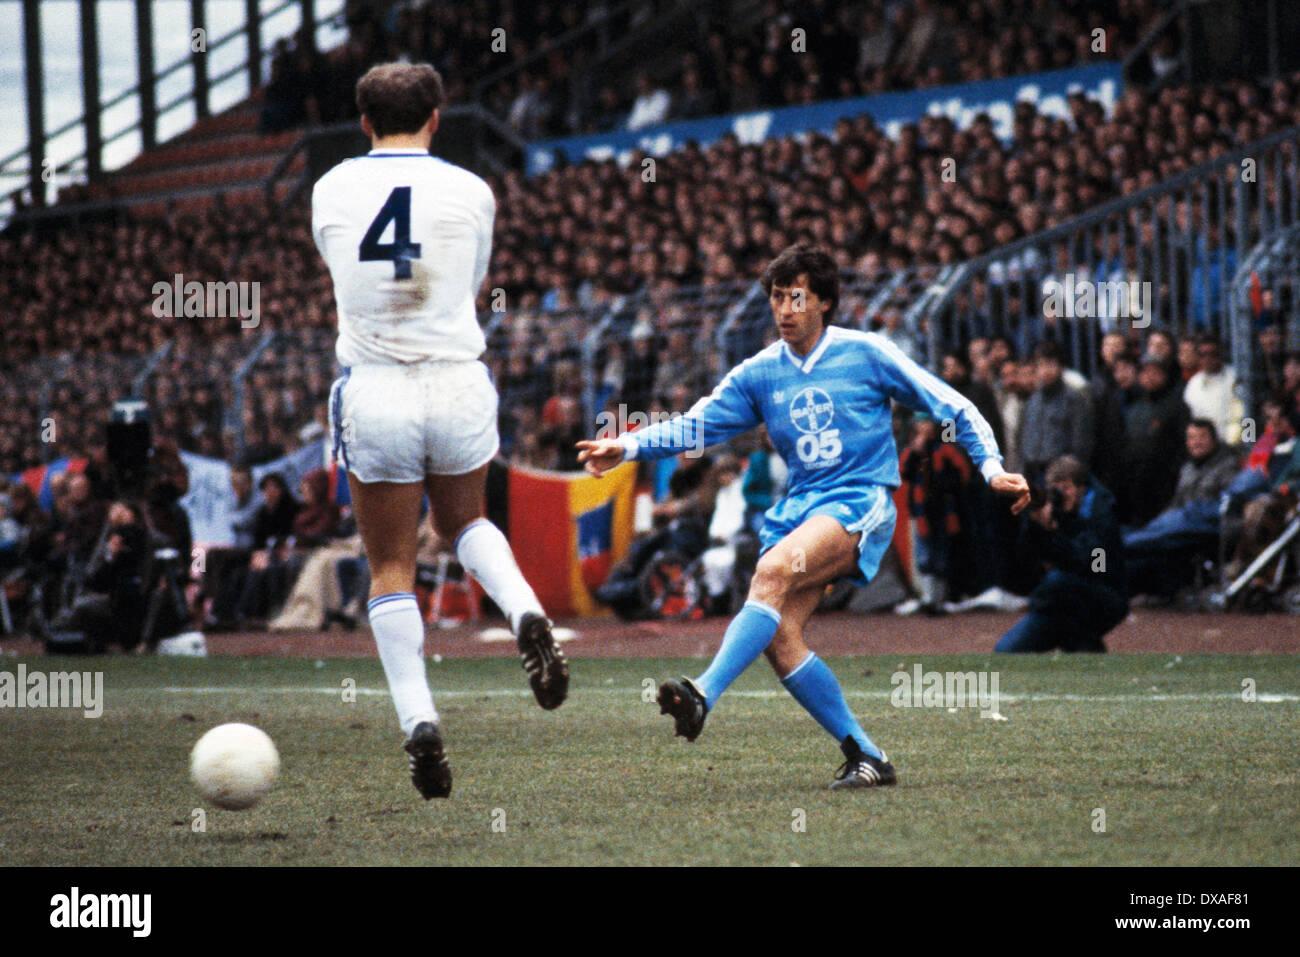 football, Bundesliga, 1984/1985, Grotenburg Stadium, FC Bayer 05 Uerdingen versus SV Waldhof Mannheim 2:2, scene of the match, Franz Raschid (Bayer) passing, left Dimitrios Tsionanis (SVW) - Stock Image